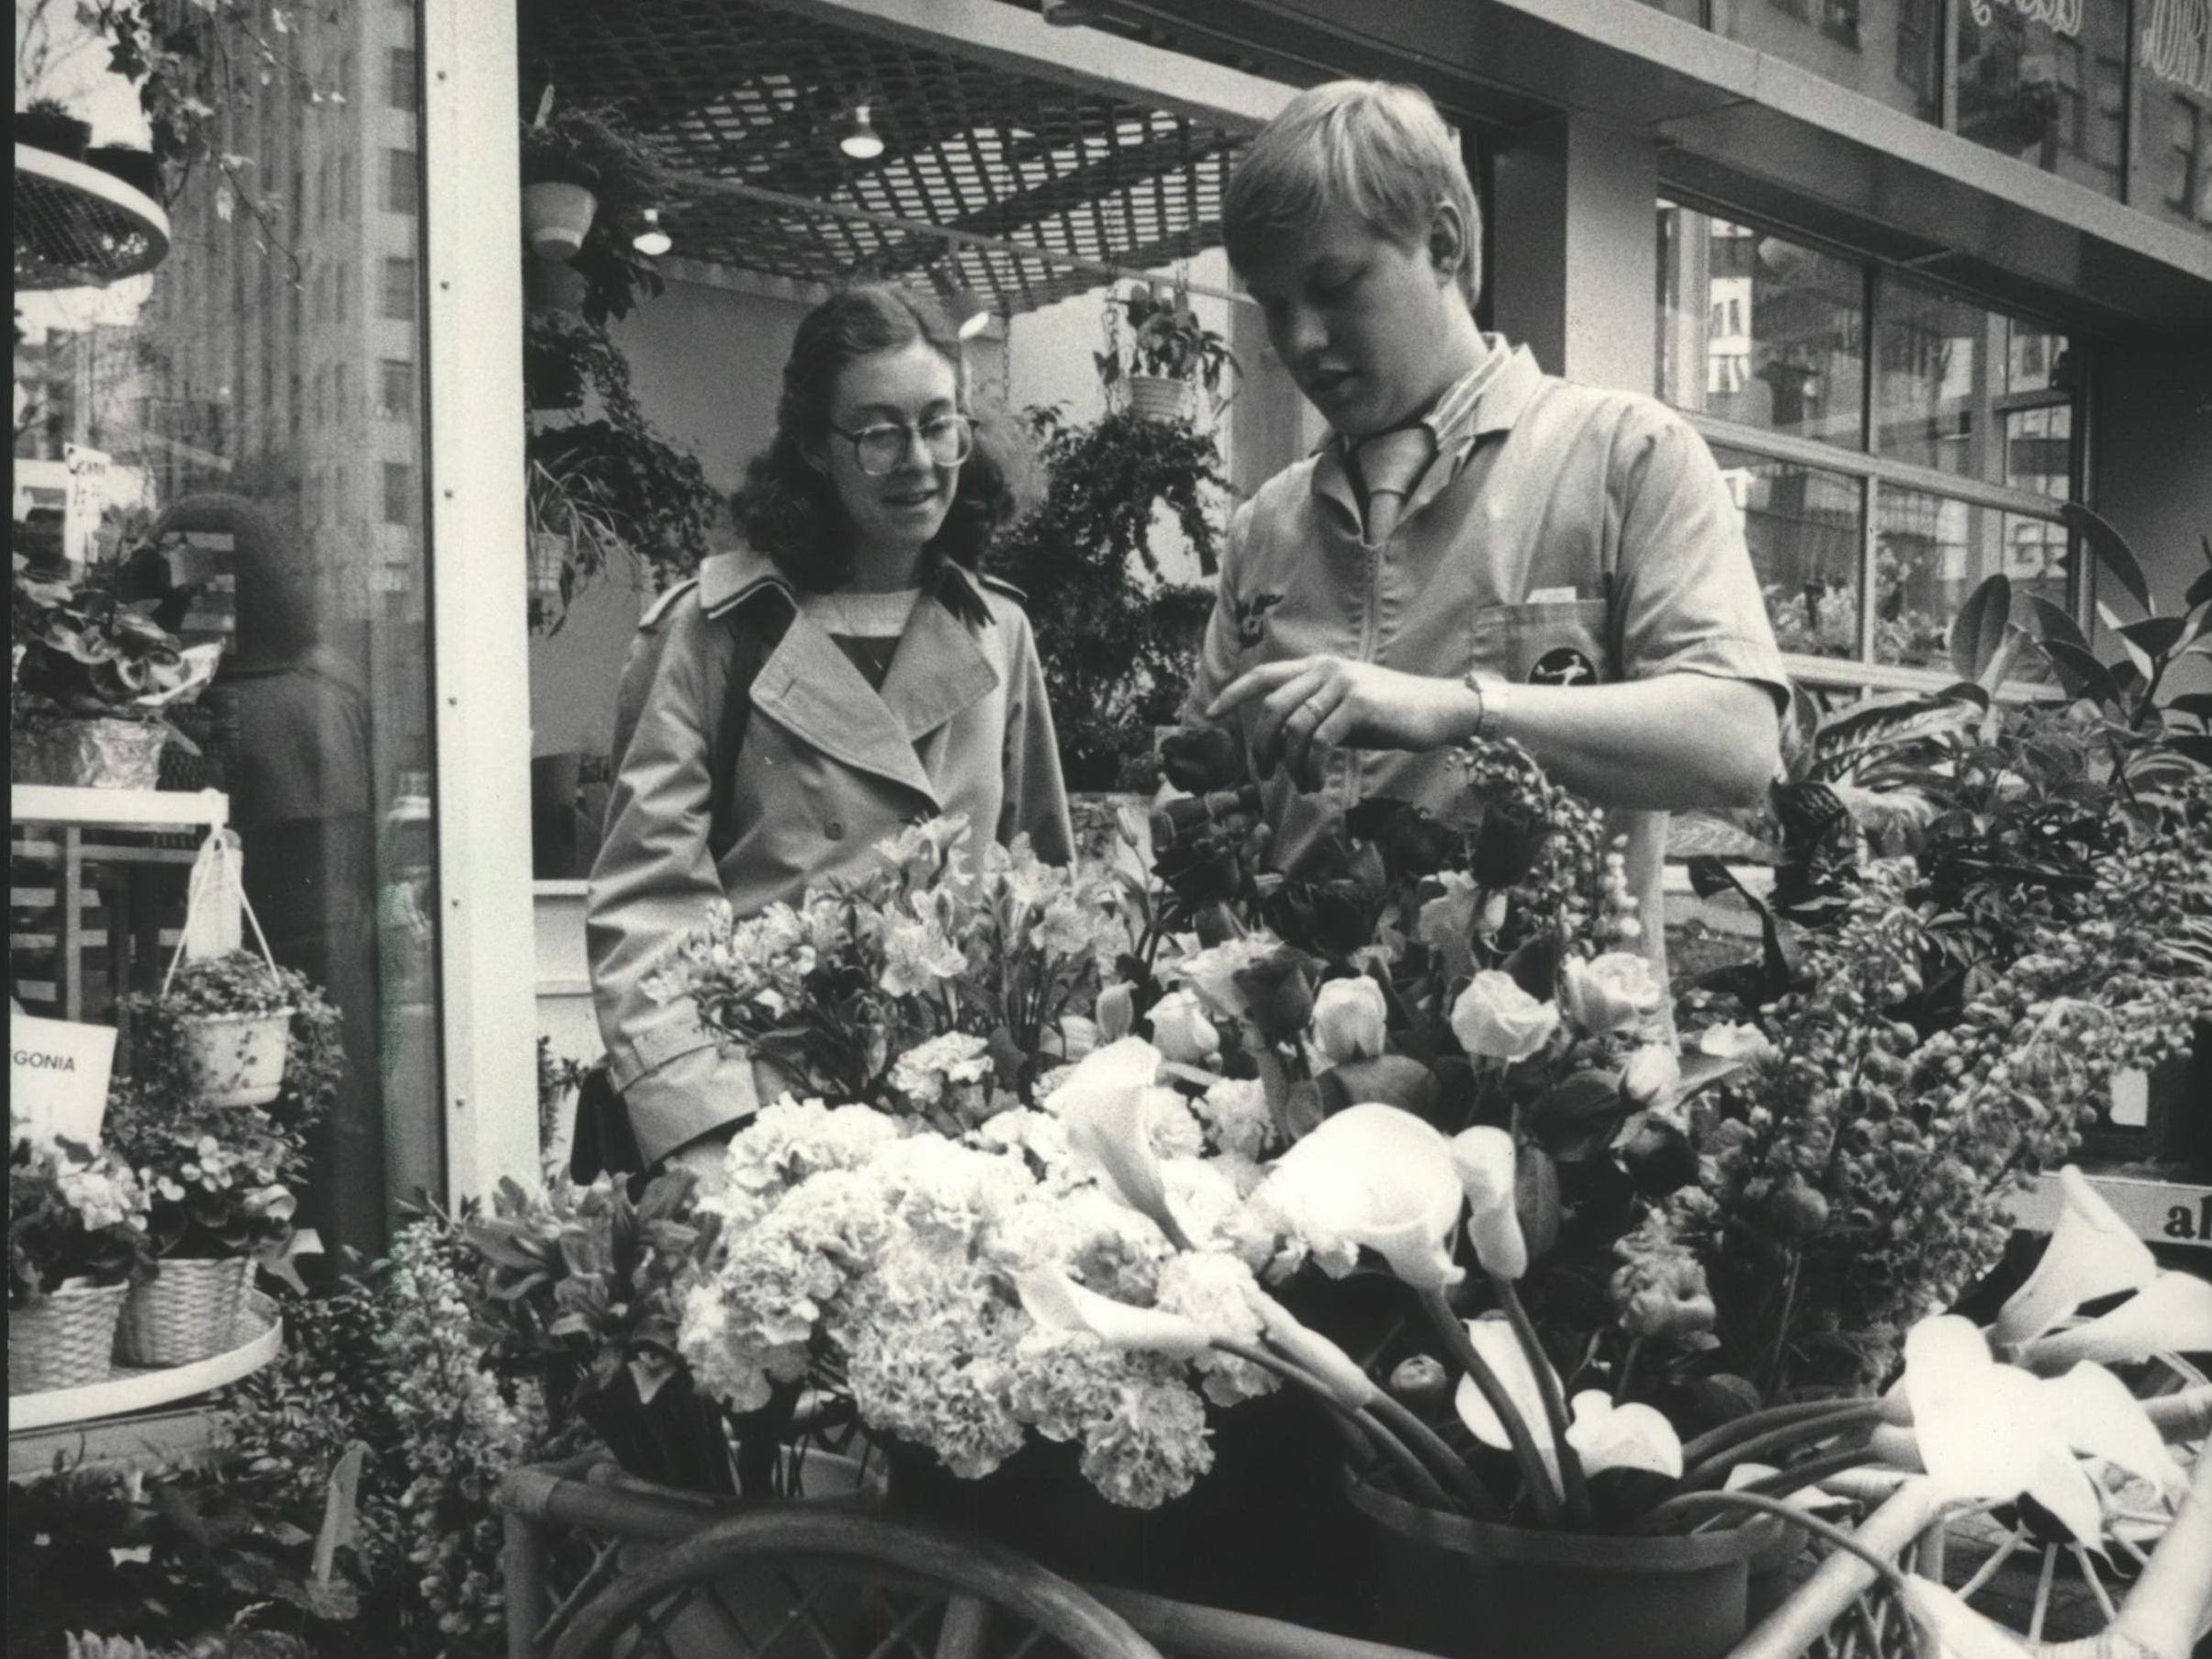 Dale Preuss helped Dana Longstreth build a bouquet at Alan Preuss Florists in the Grand Avenue.